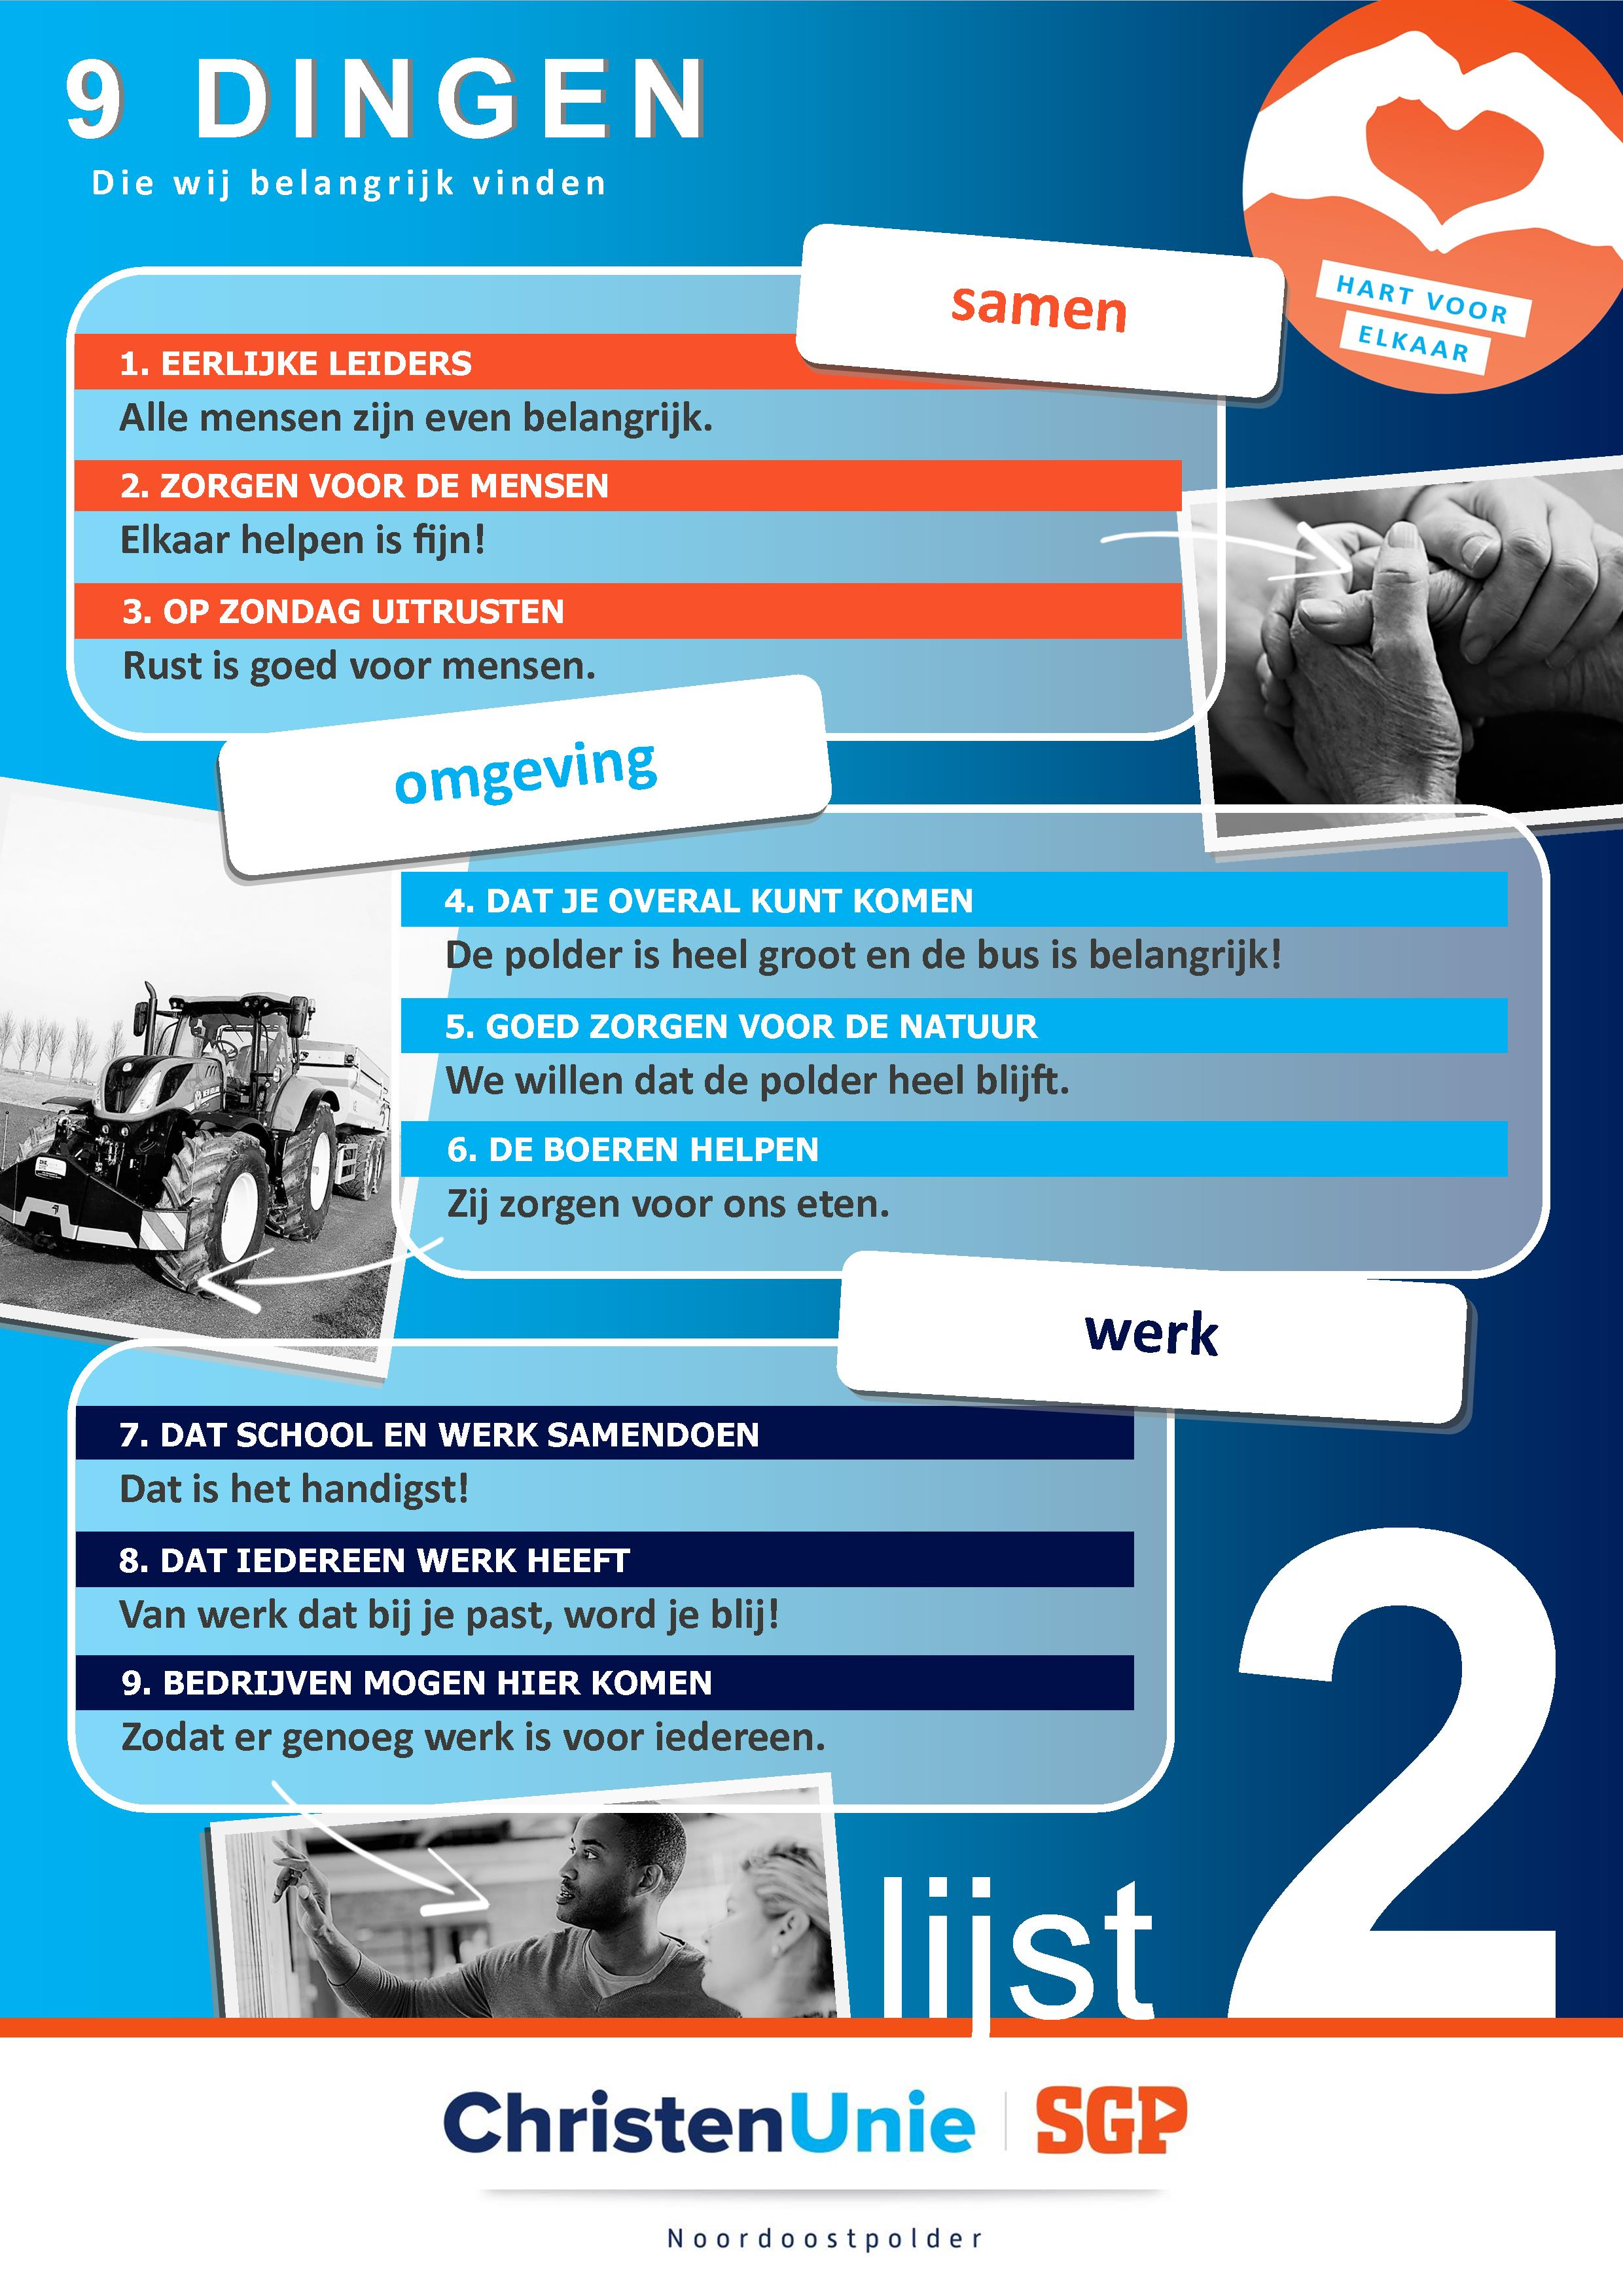 boeren only.com dating website Shark dating advies